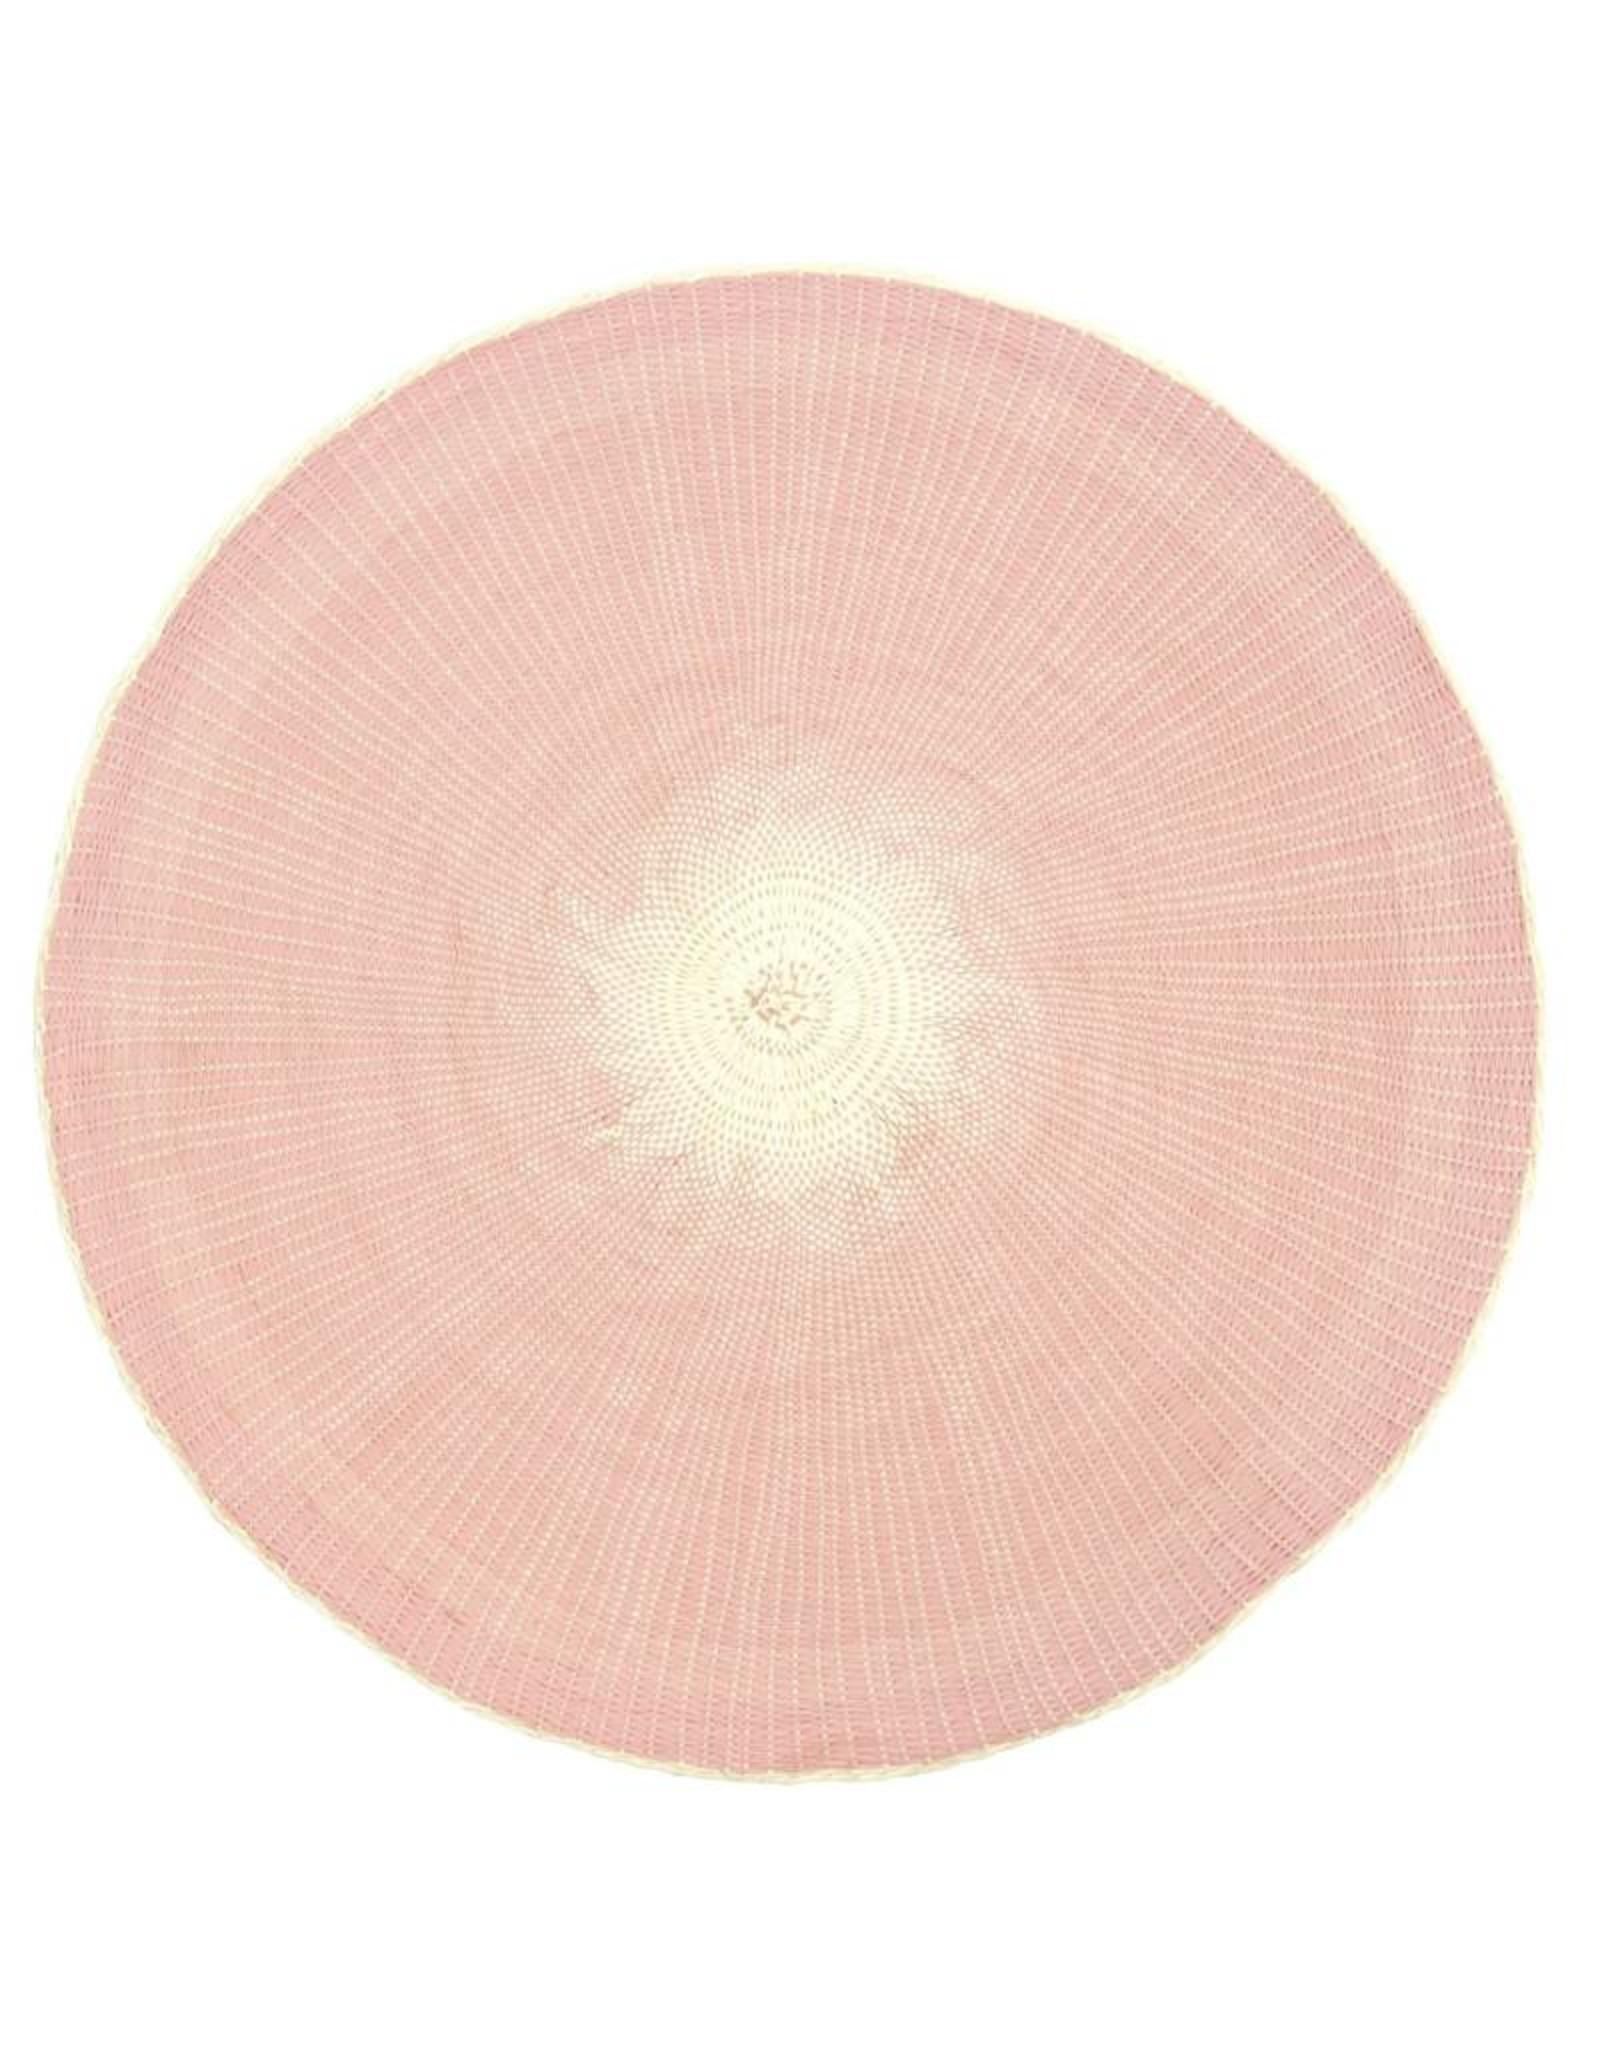 Indaba Willa Placemat - Pink